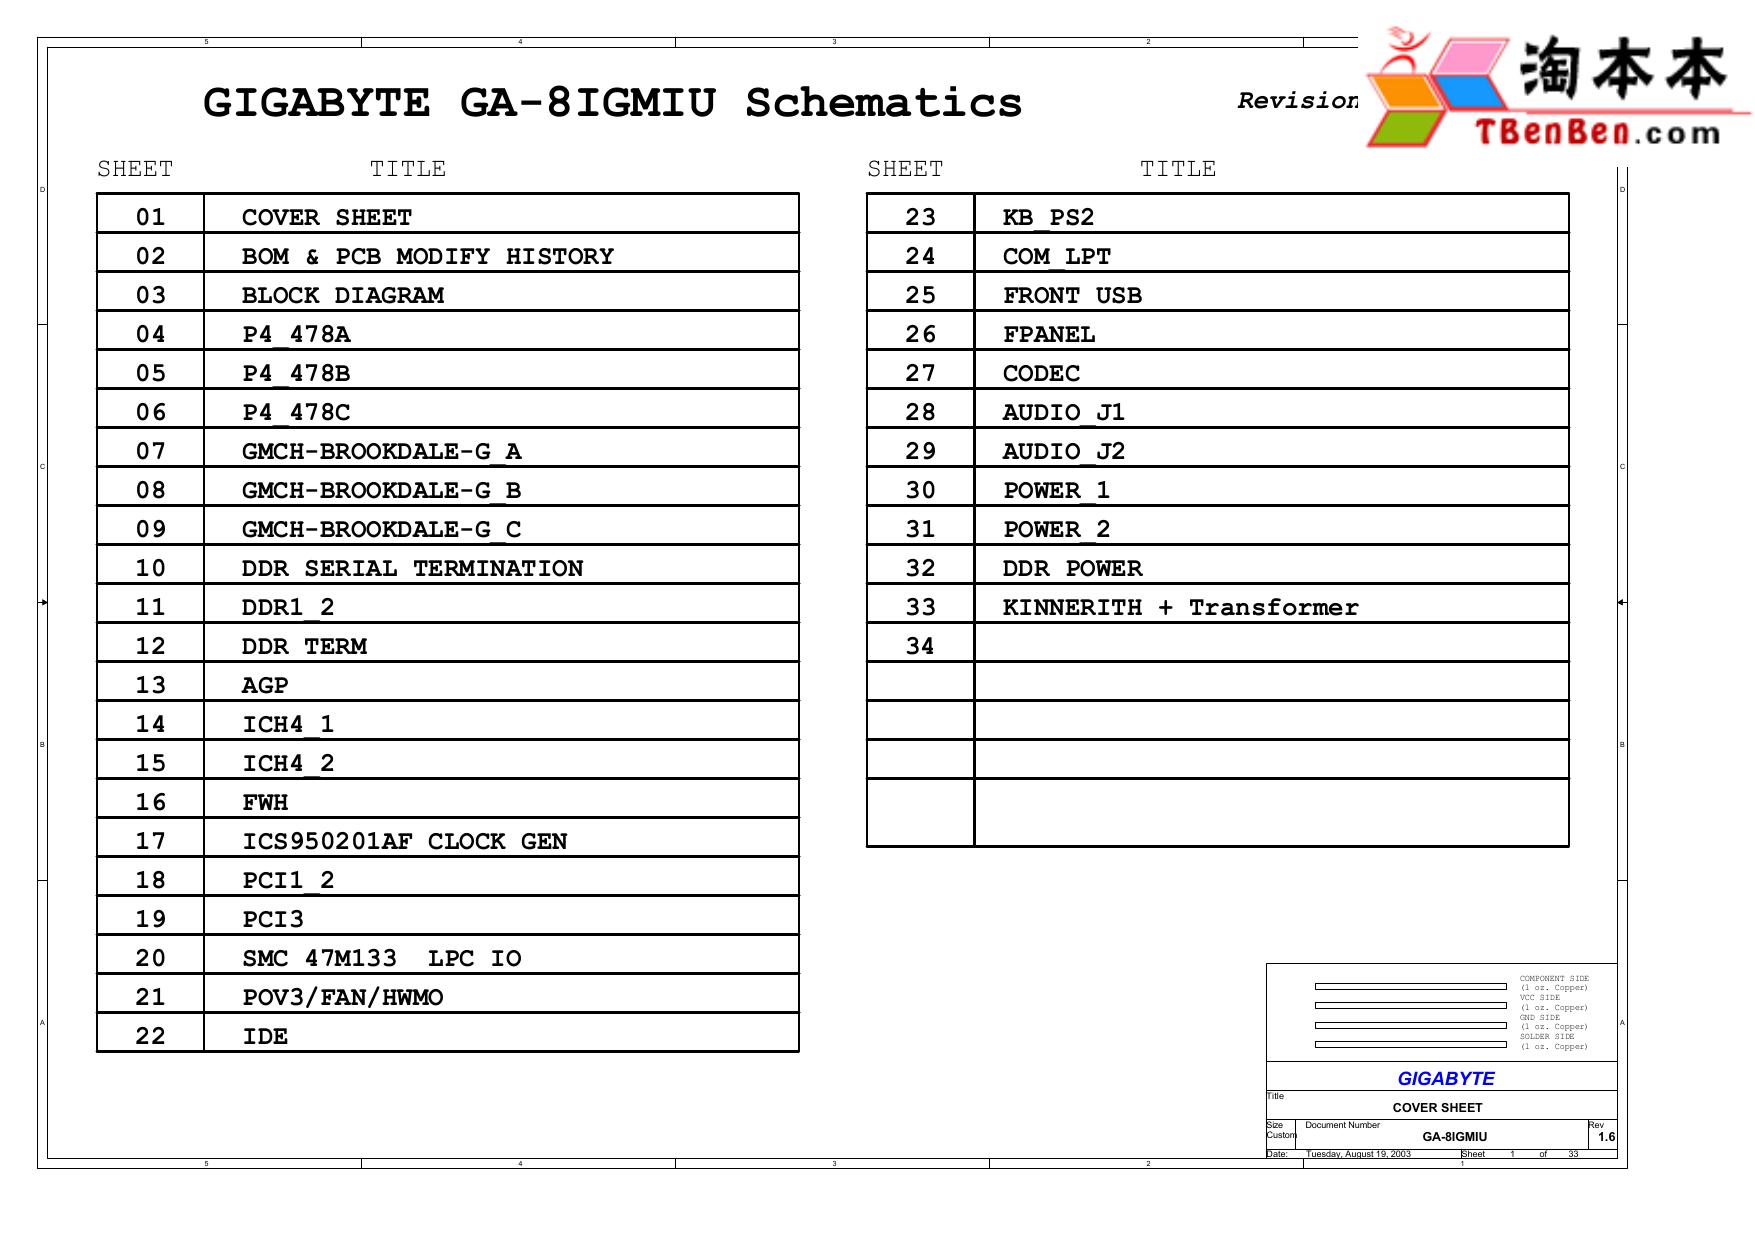 Ga-8igmiu Manualzz Ga-8igmiu Gigabyte Gigabyte Ga-8igmiu Schematics Schematics Manualzz Gigabyte